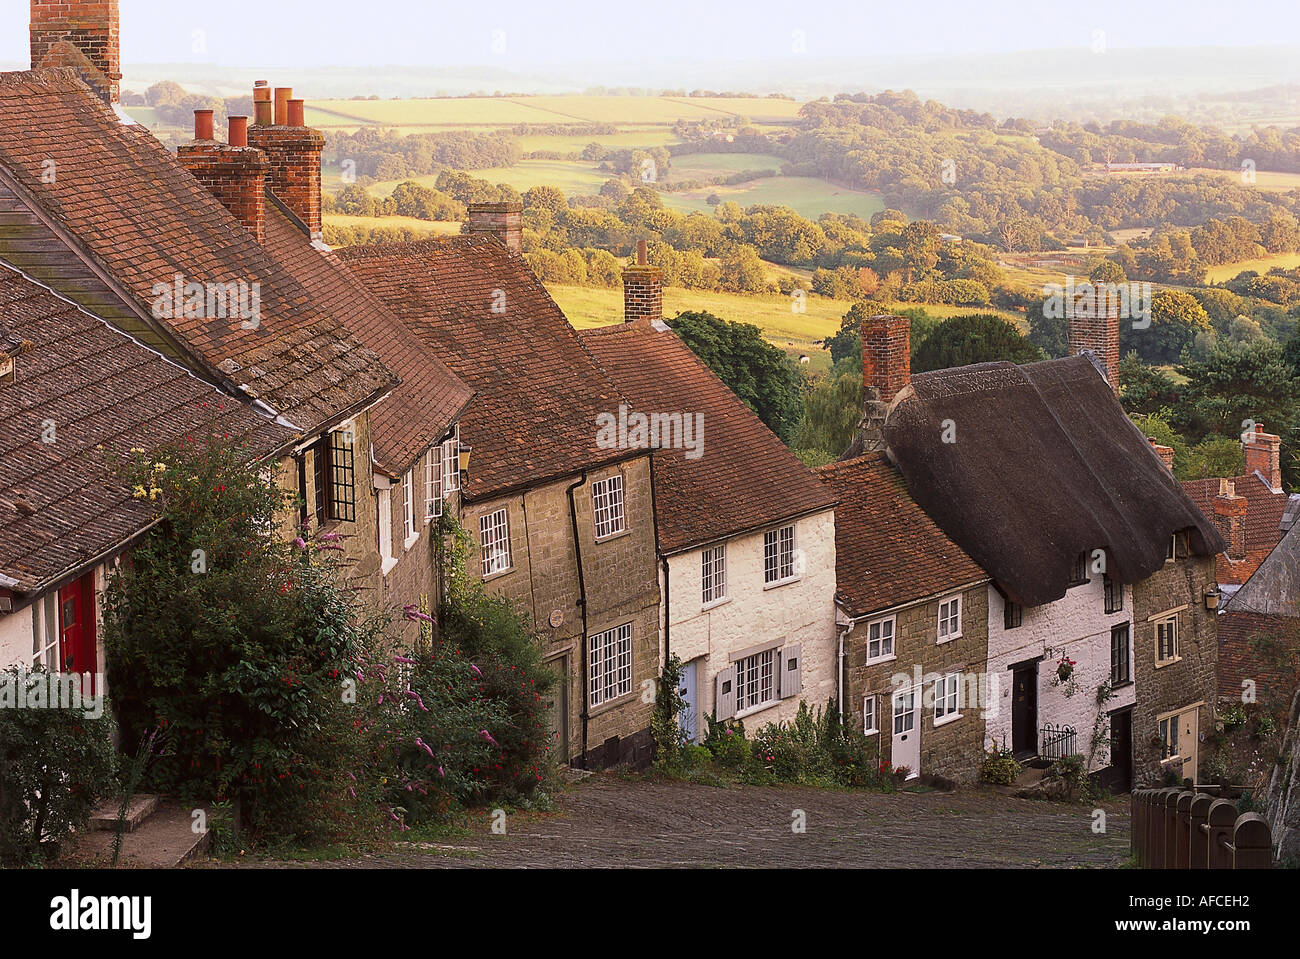 Gold Hill, Shaftesbury, Dorset England - Stock Image